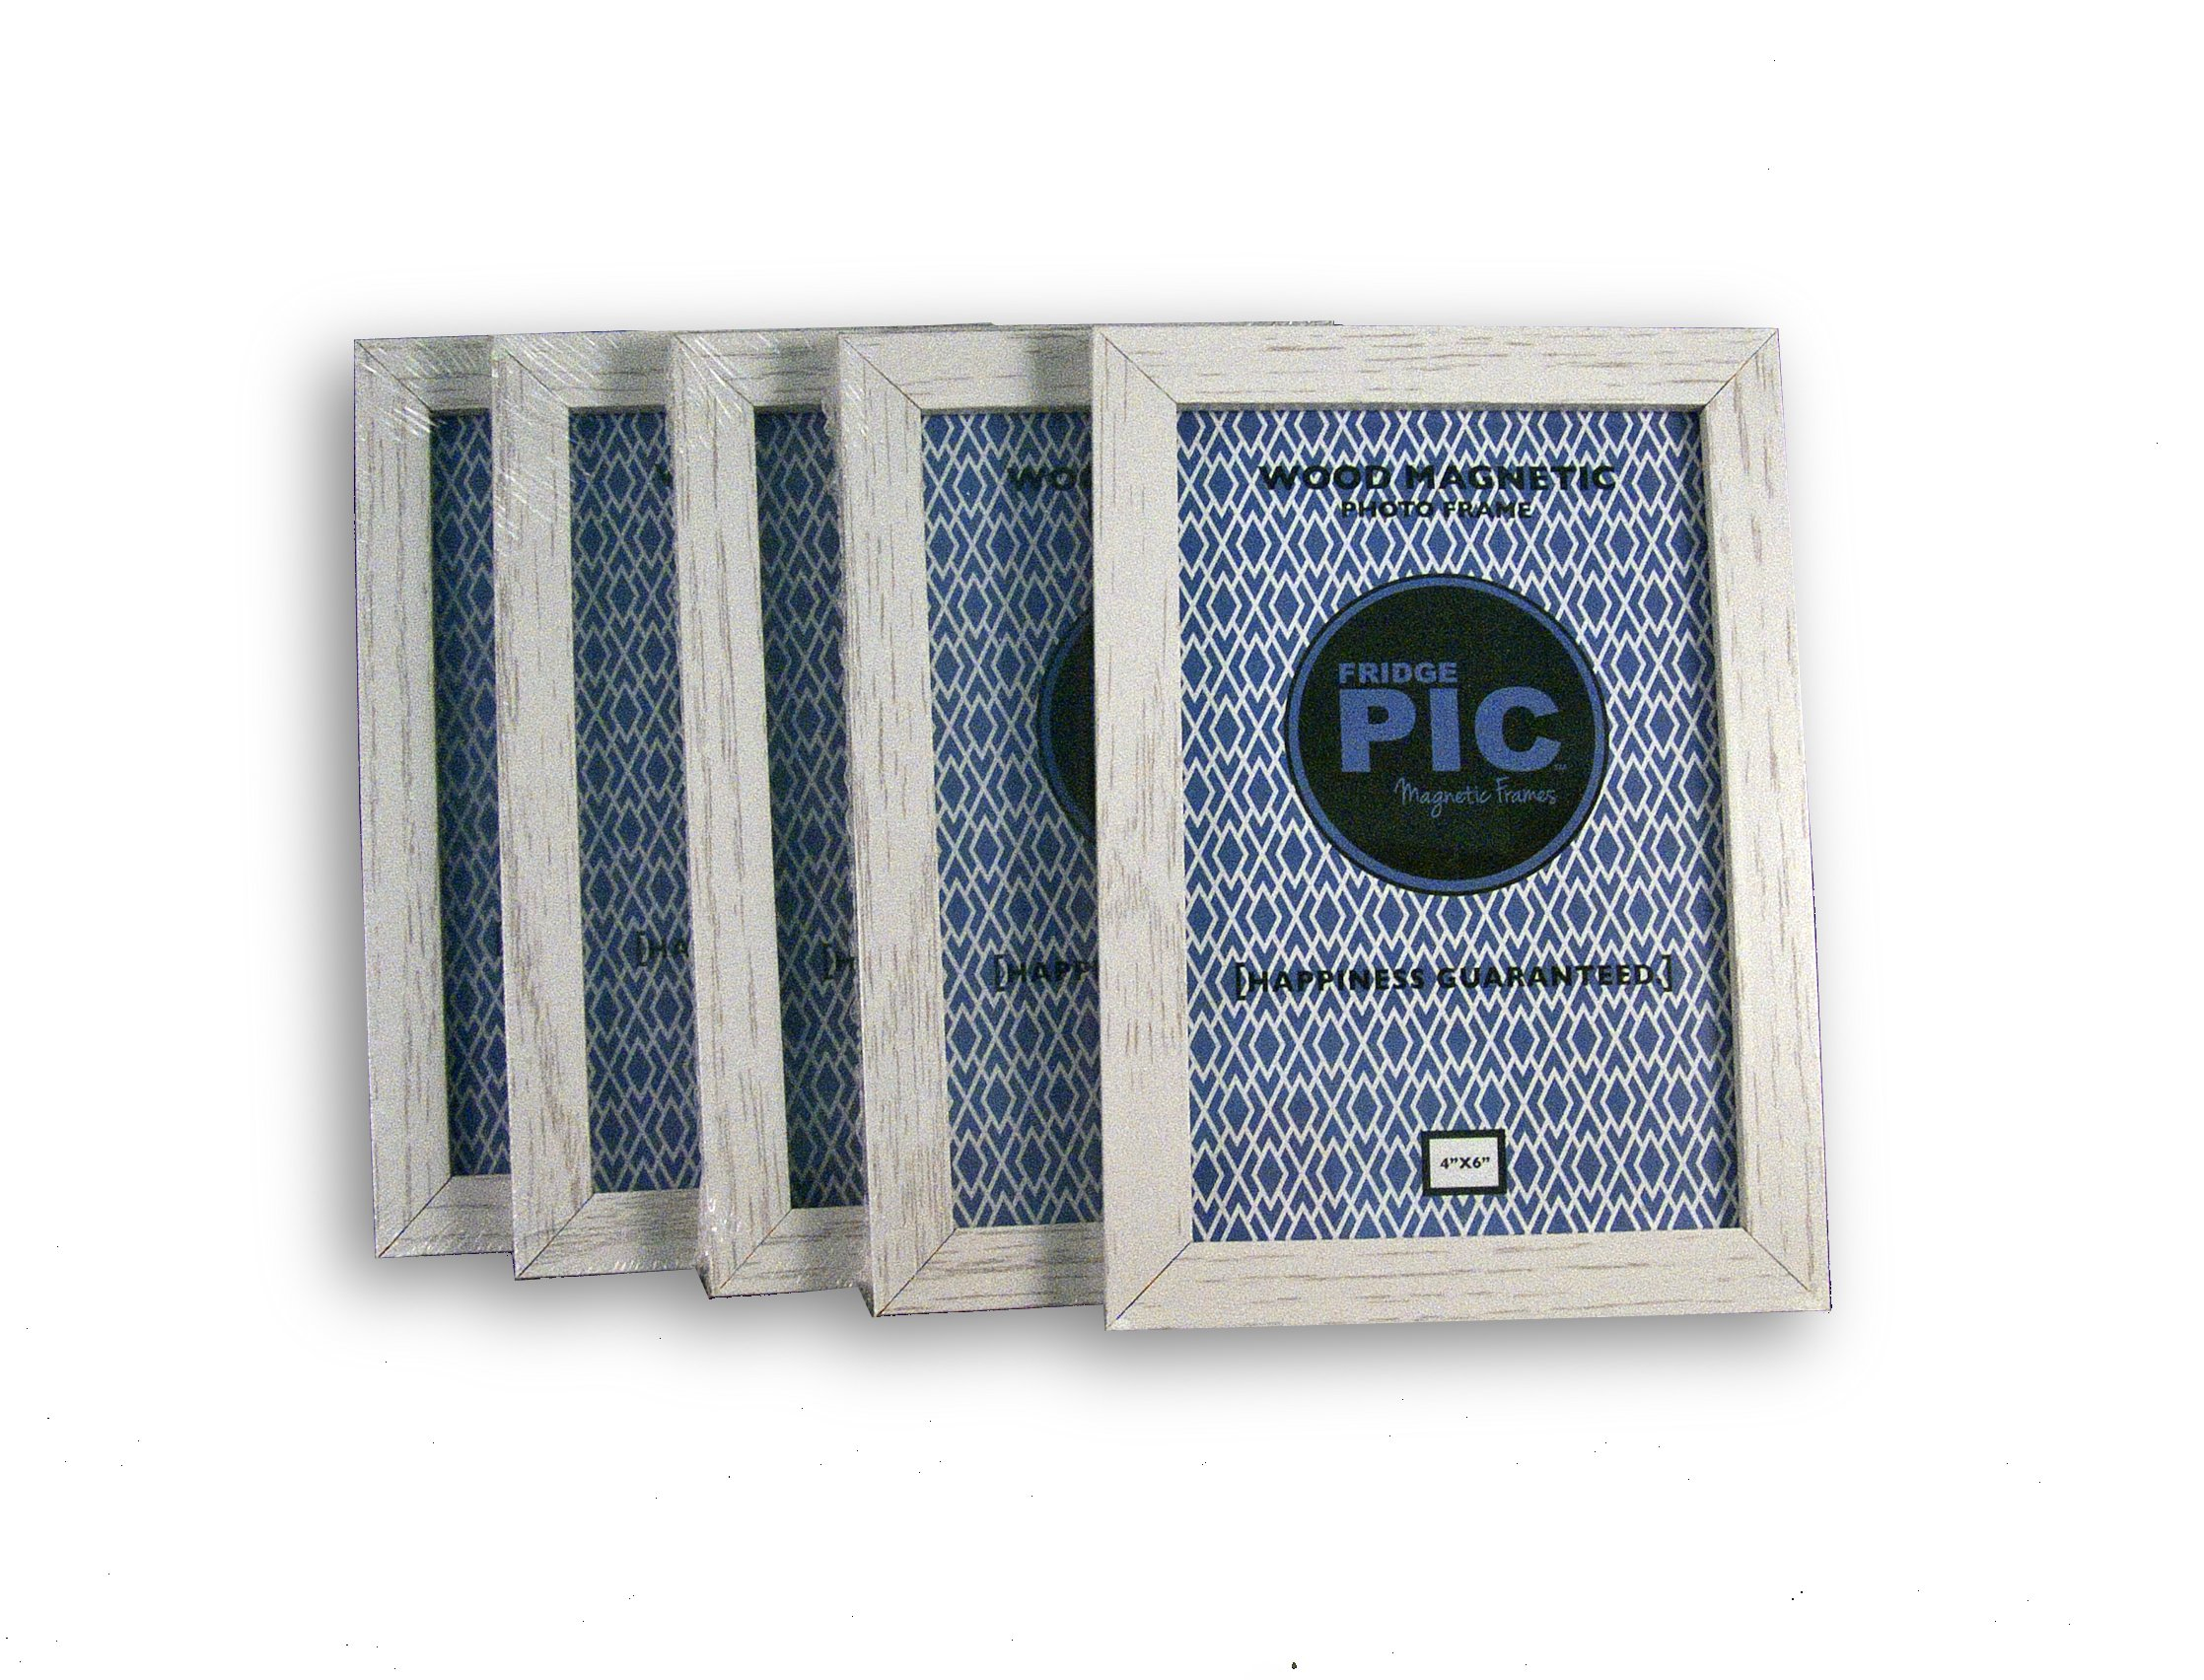 Fridgepic Wood Magnetic Photo Picture Frames, Black - Set of 5 (4x6) by FridgePIC Magnetic Frames (Image #7)